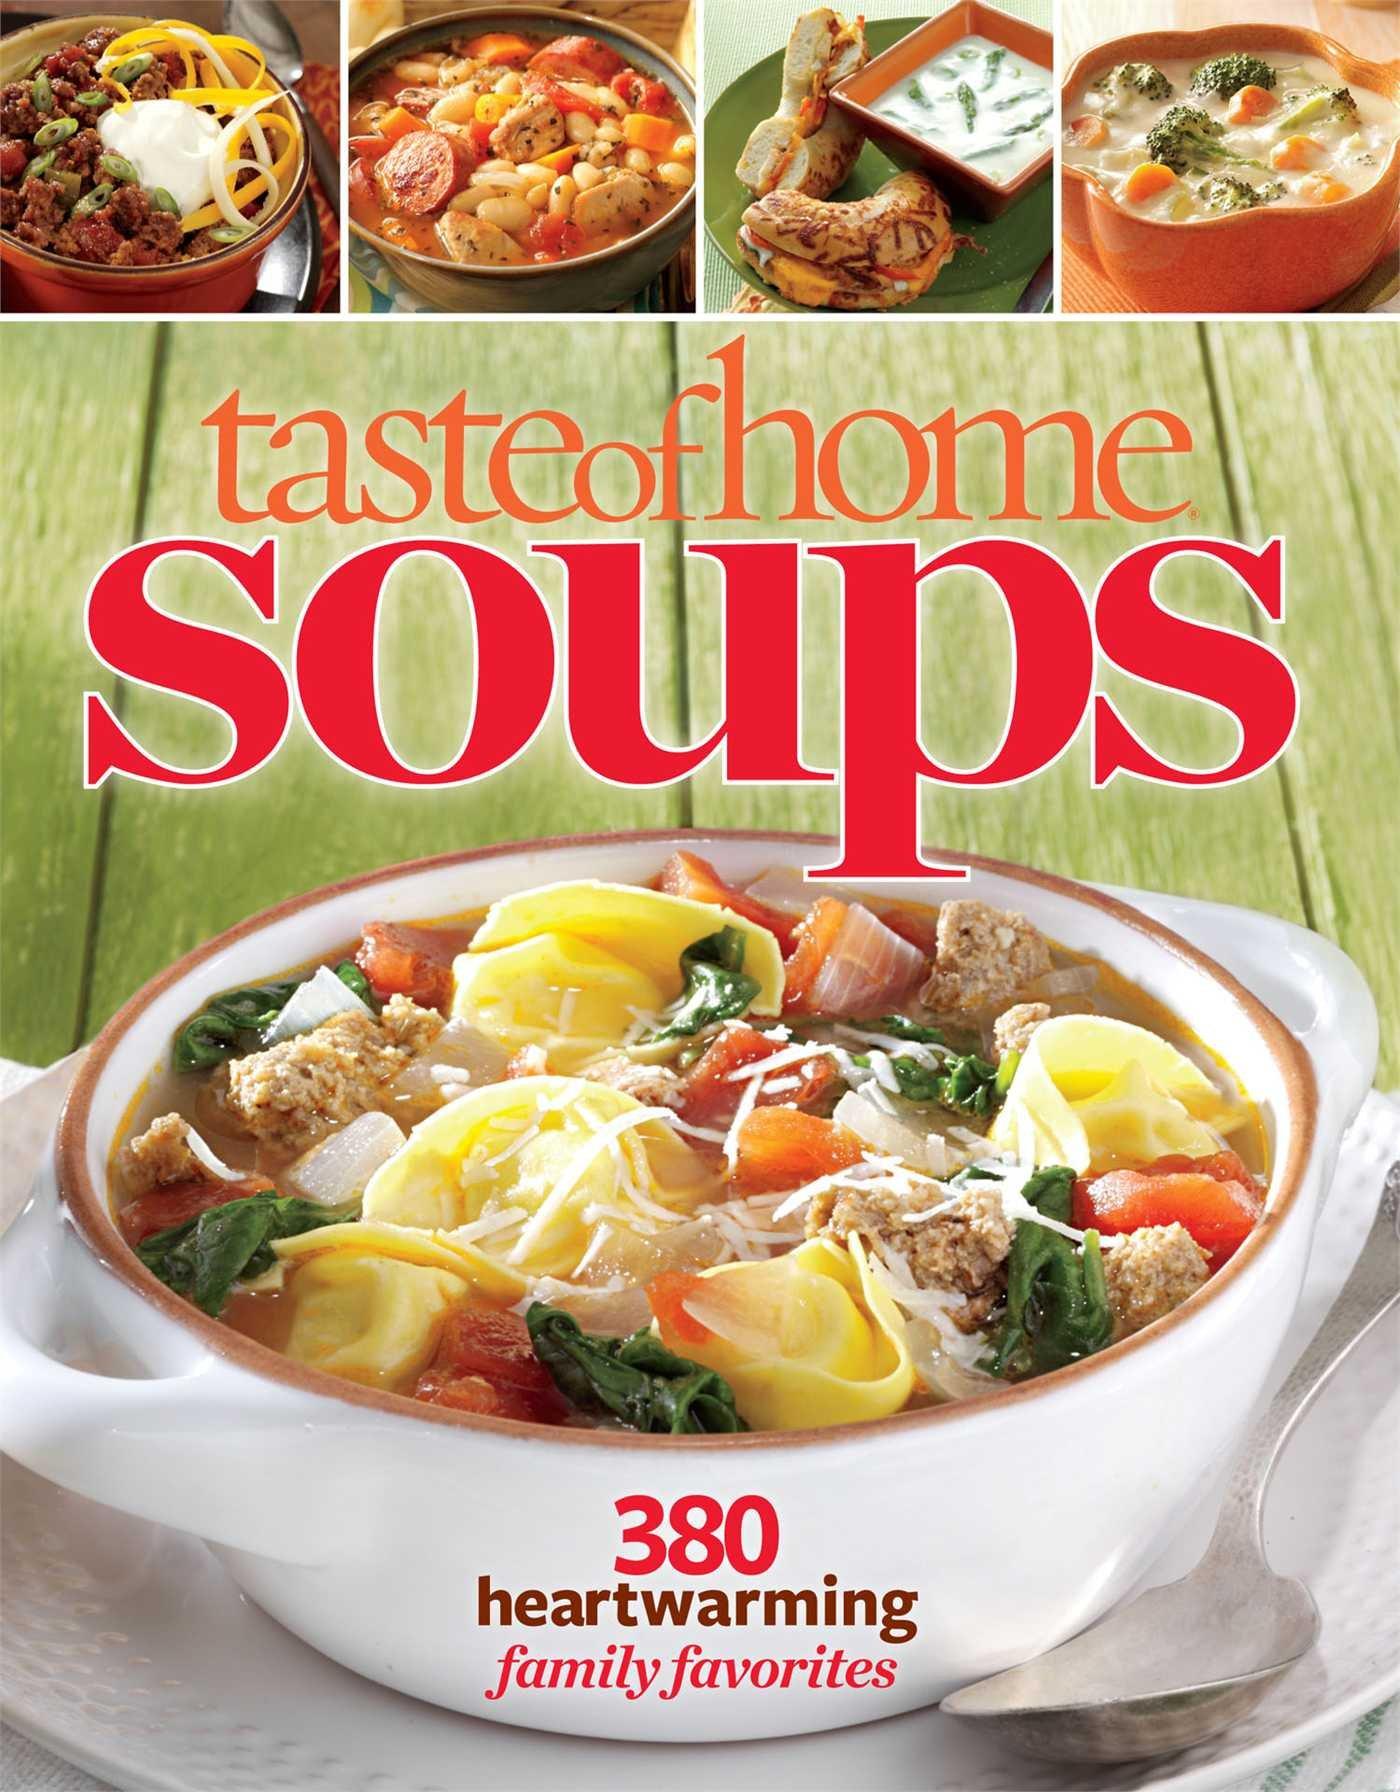 Taste Of Home Soups 380 Heartwarming Family Favorites Editors At